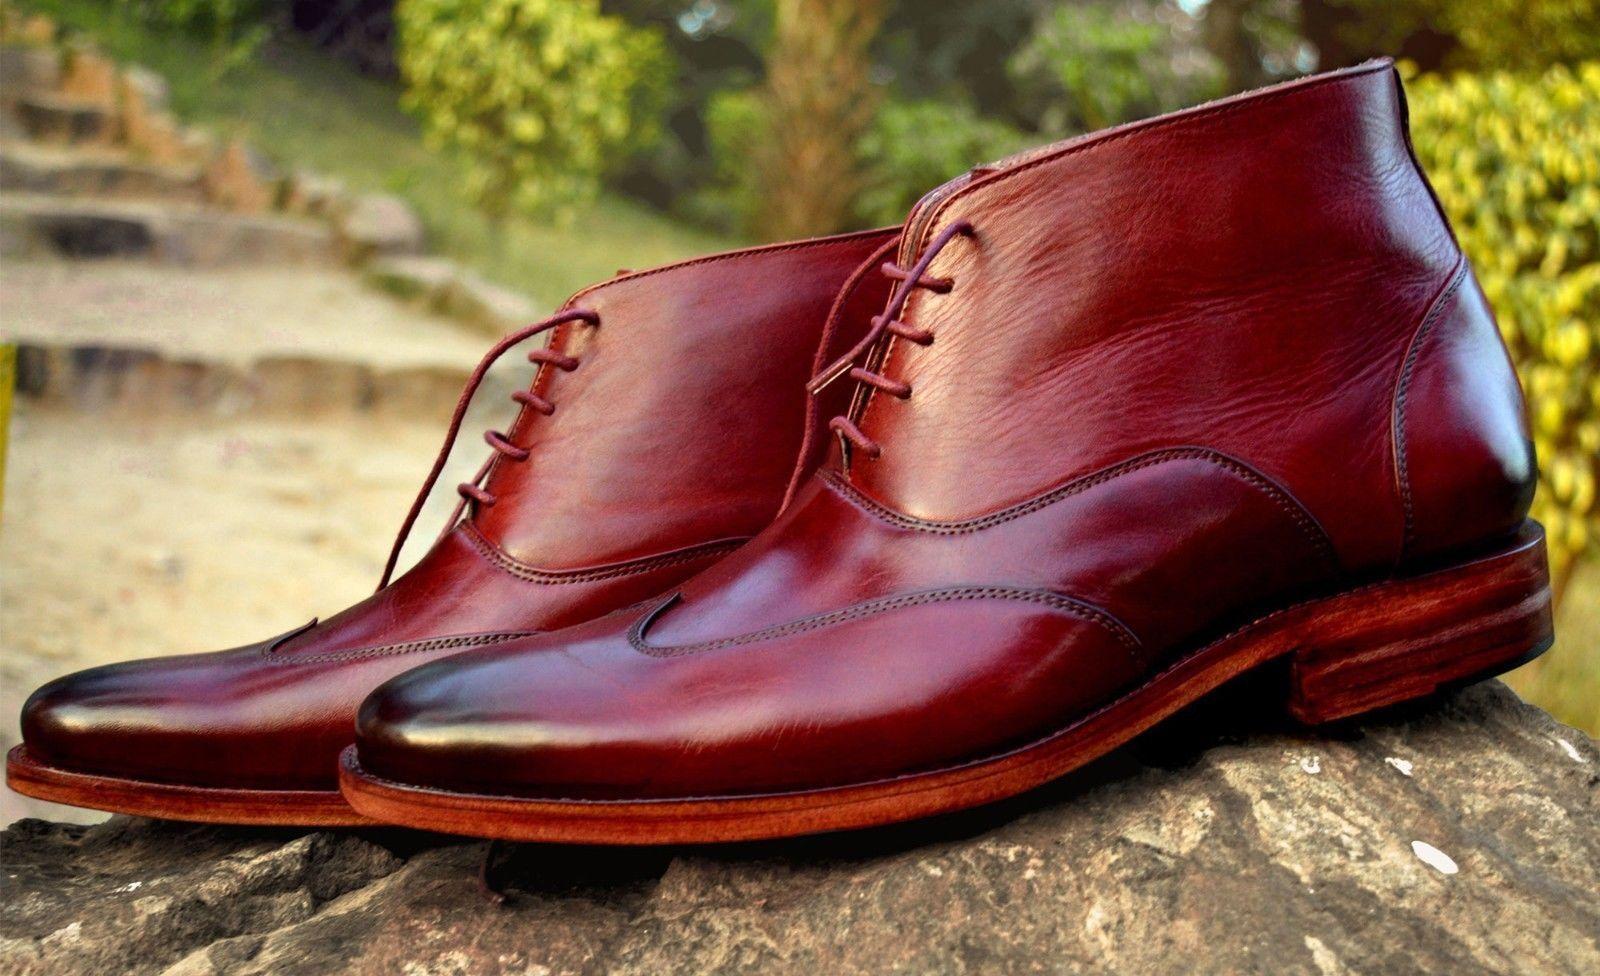 Handmade Maroon Ankle High Stivali Stivali Pelle Wing Tip Chukka Denim Casual Stivali Stivali Uomo dfa1fc